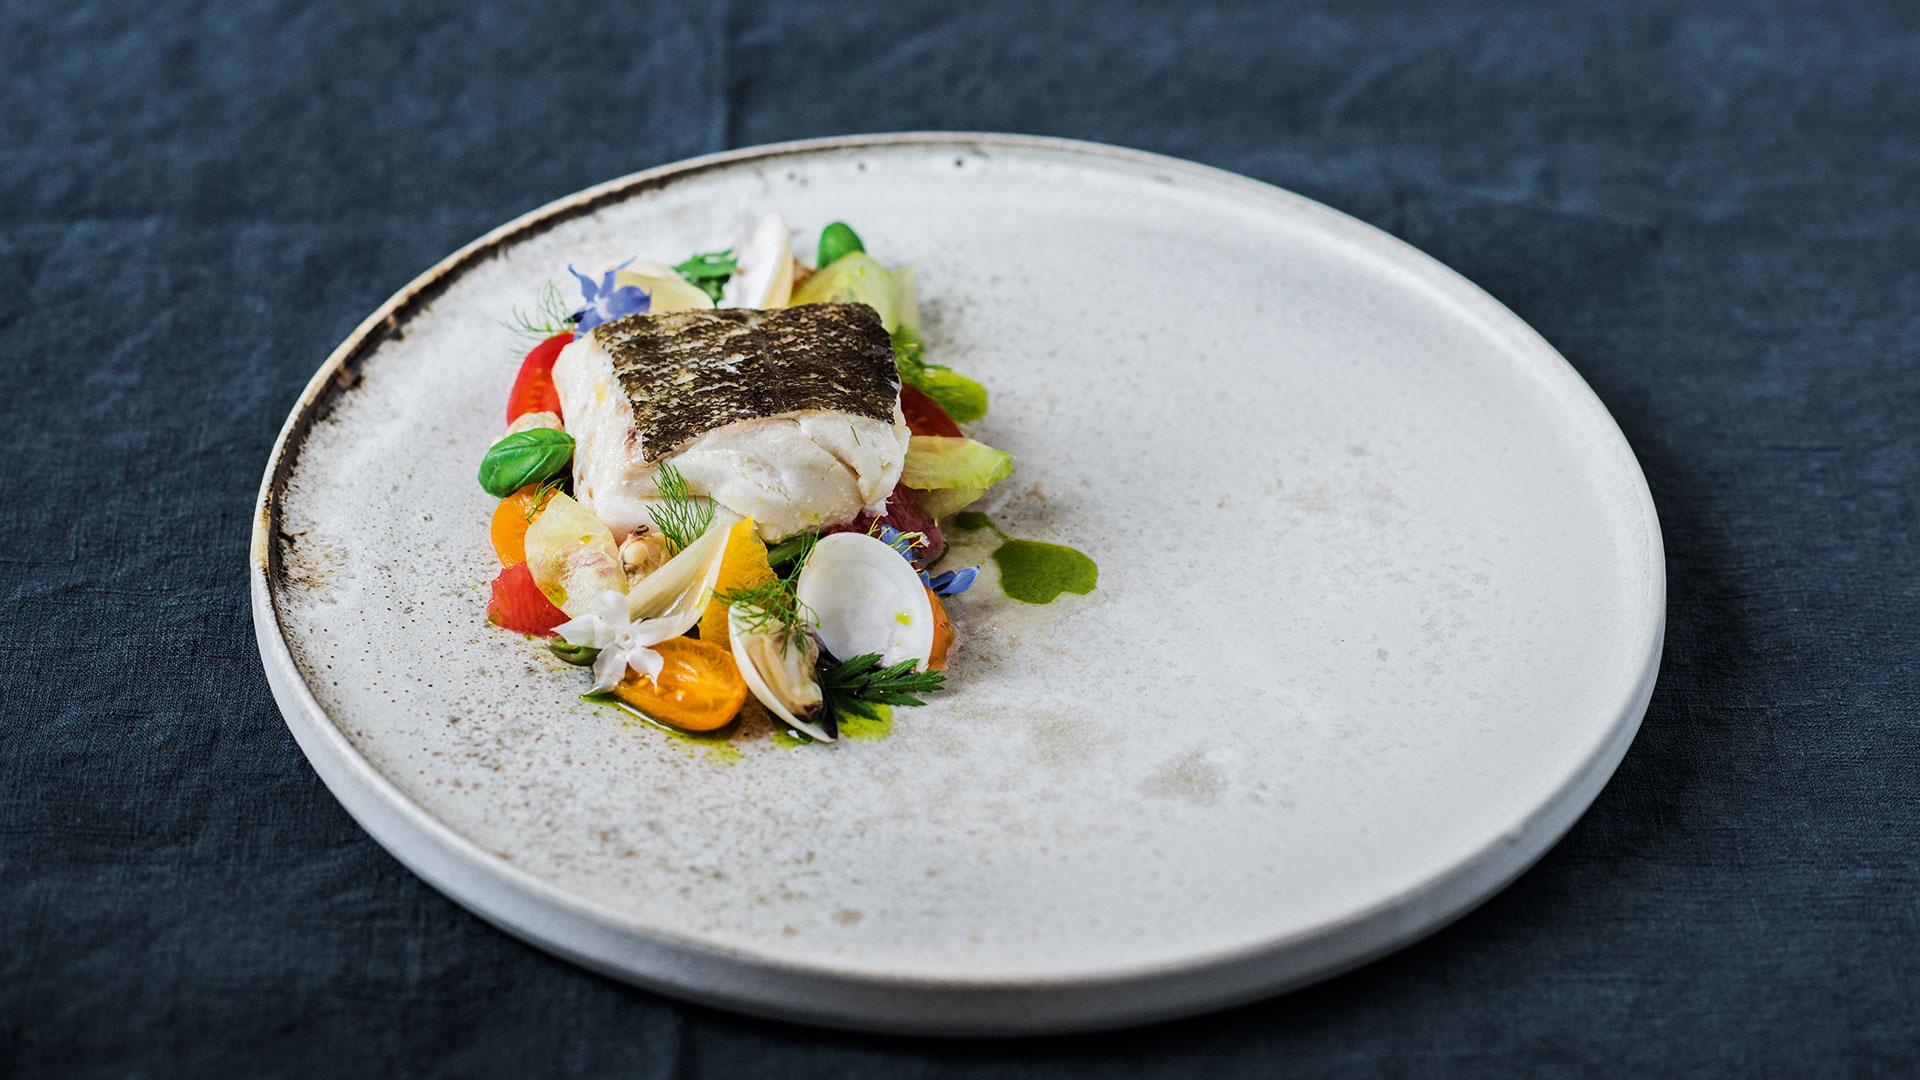 Simon Hulstone's Norwegian cod with clams